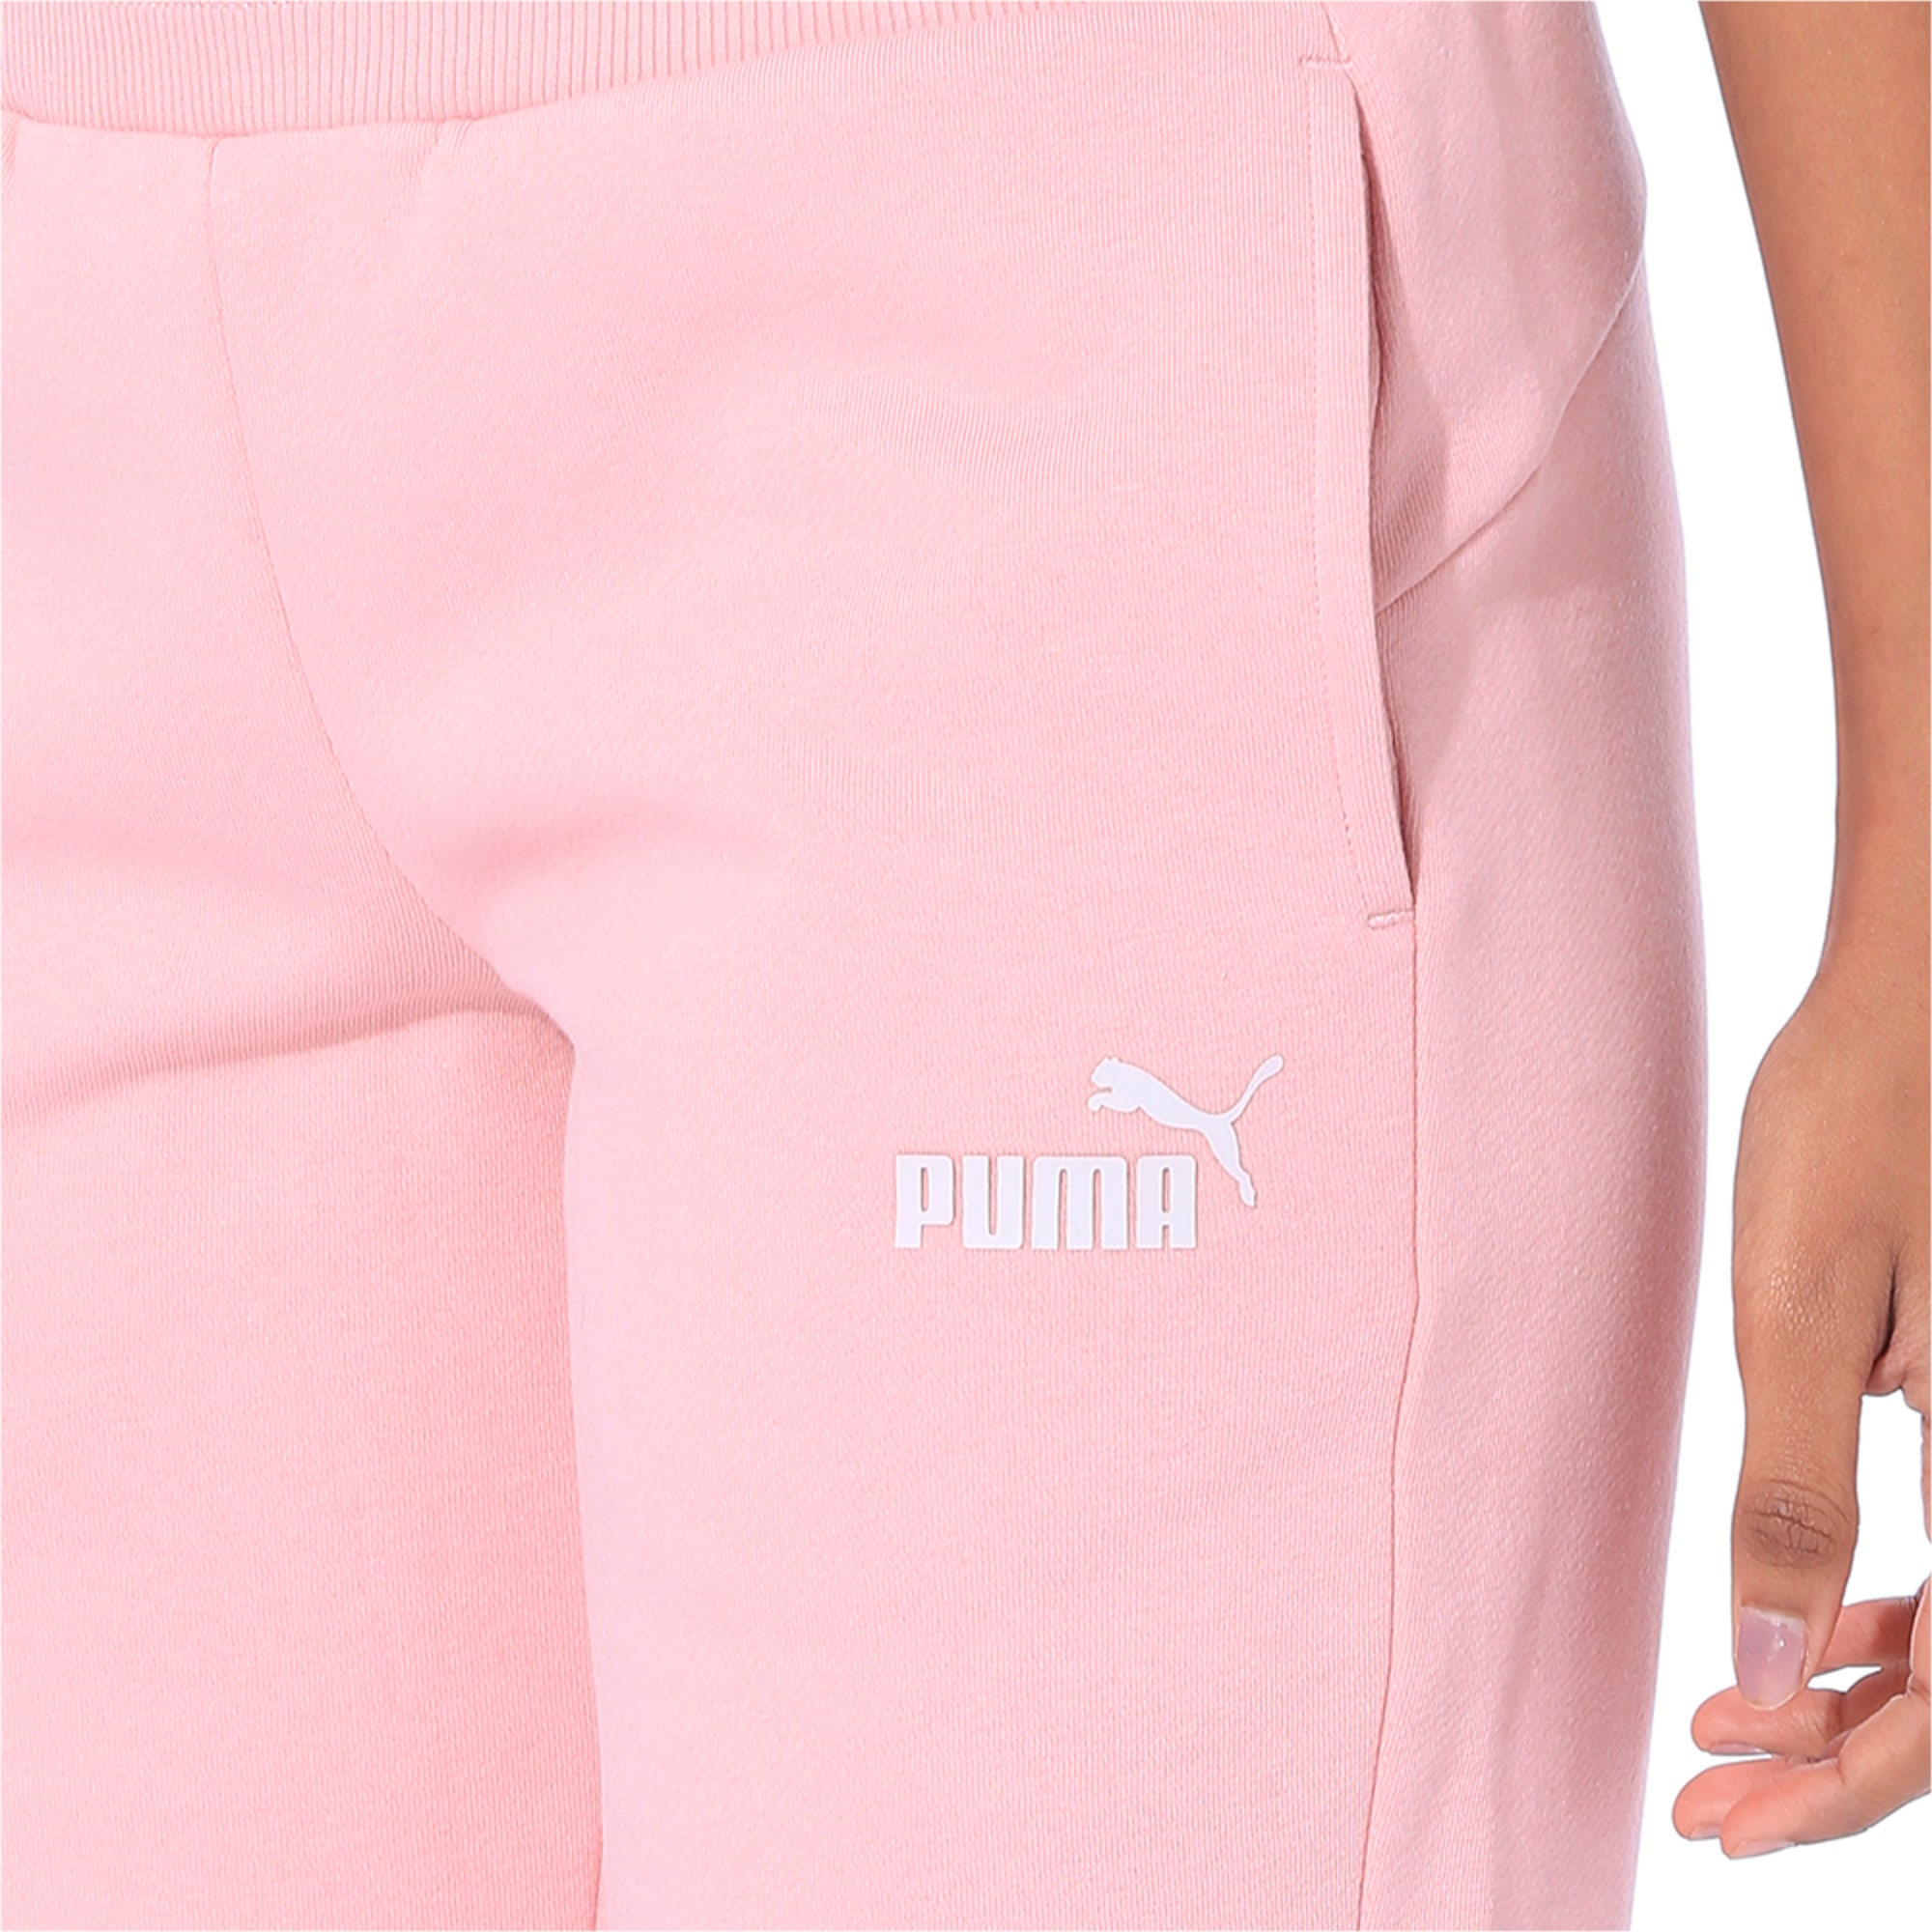 Thumbnail 6 of Essentials Fleece Women's Sweatpants, Bridal Rose, medium-IND